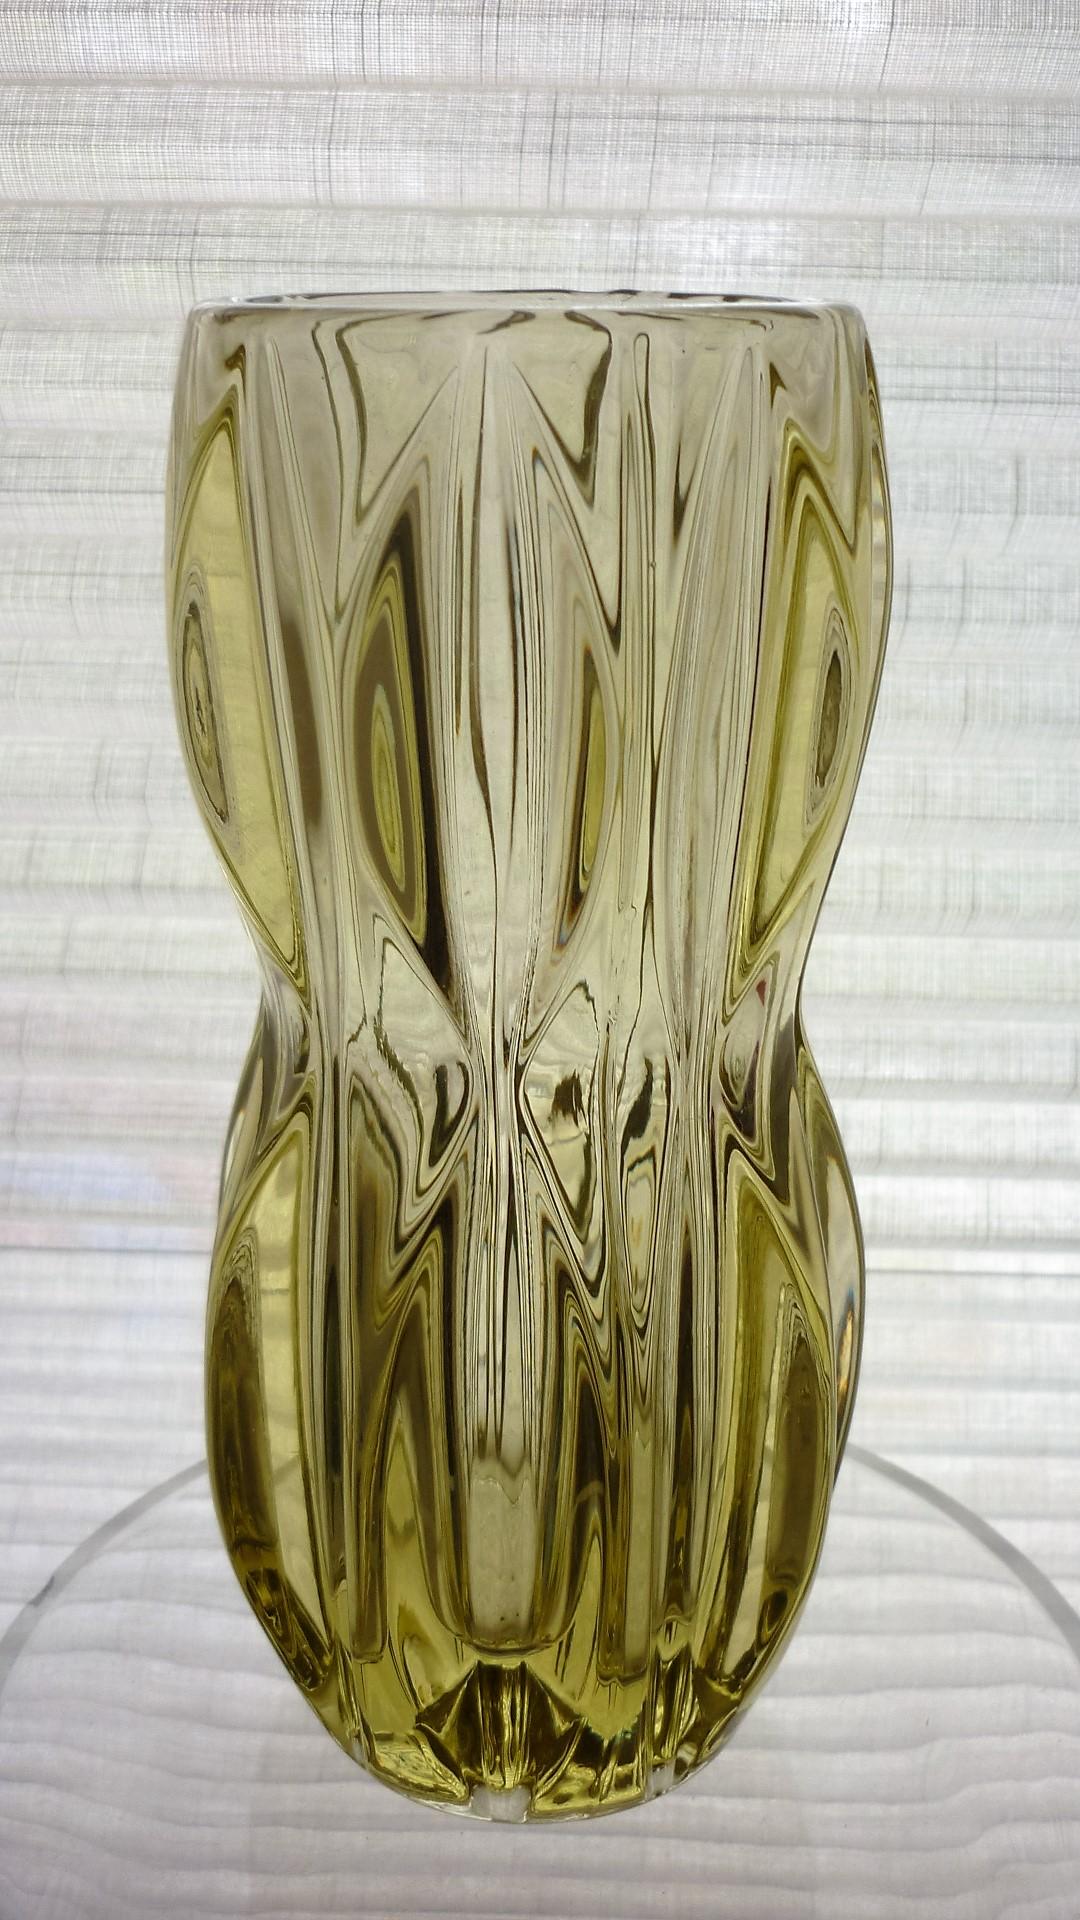 Sklo Union iconic Ypsilon vase. Designed by Jan Schmidt in the 1960s